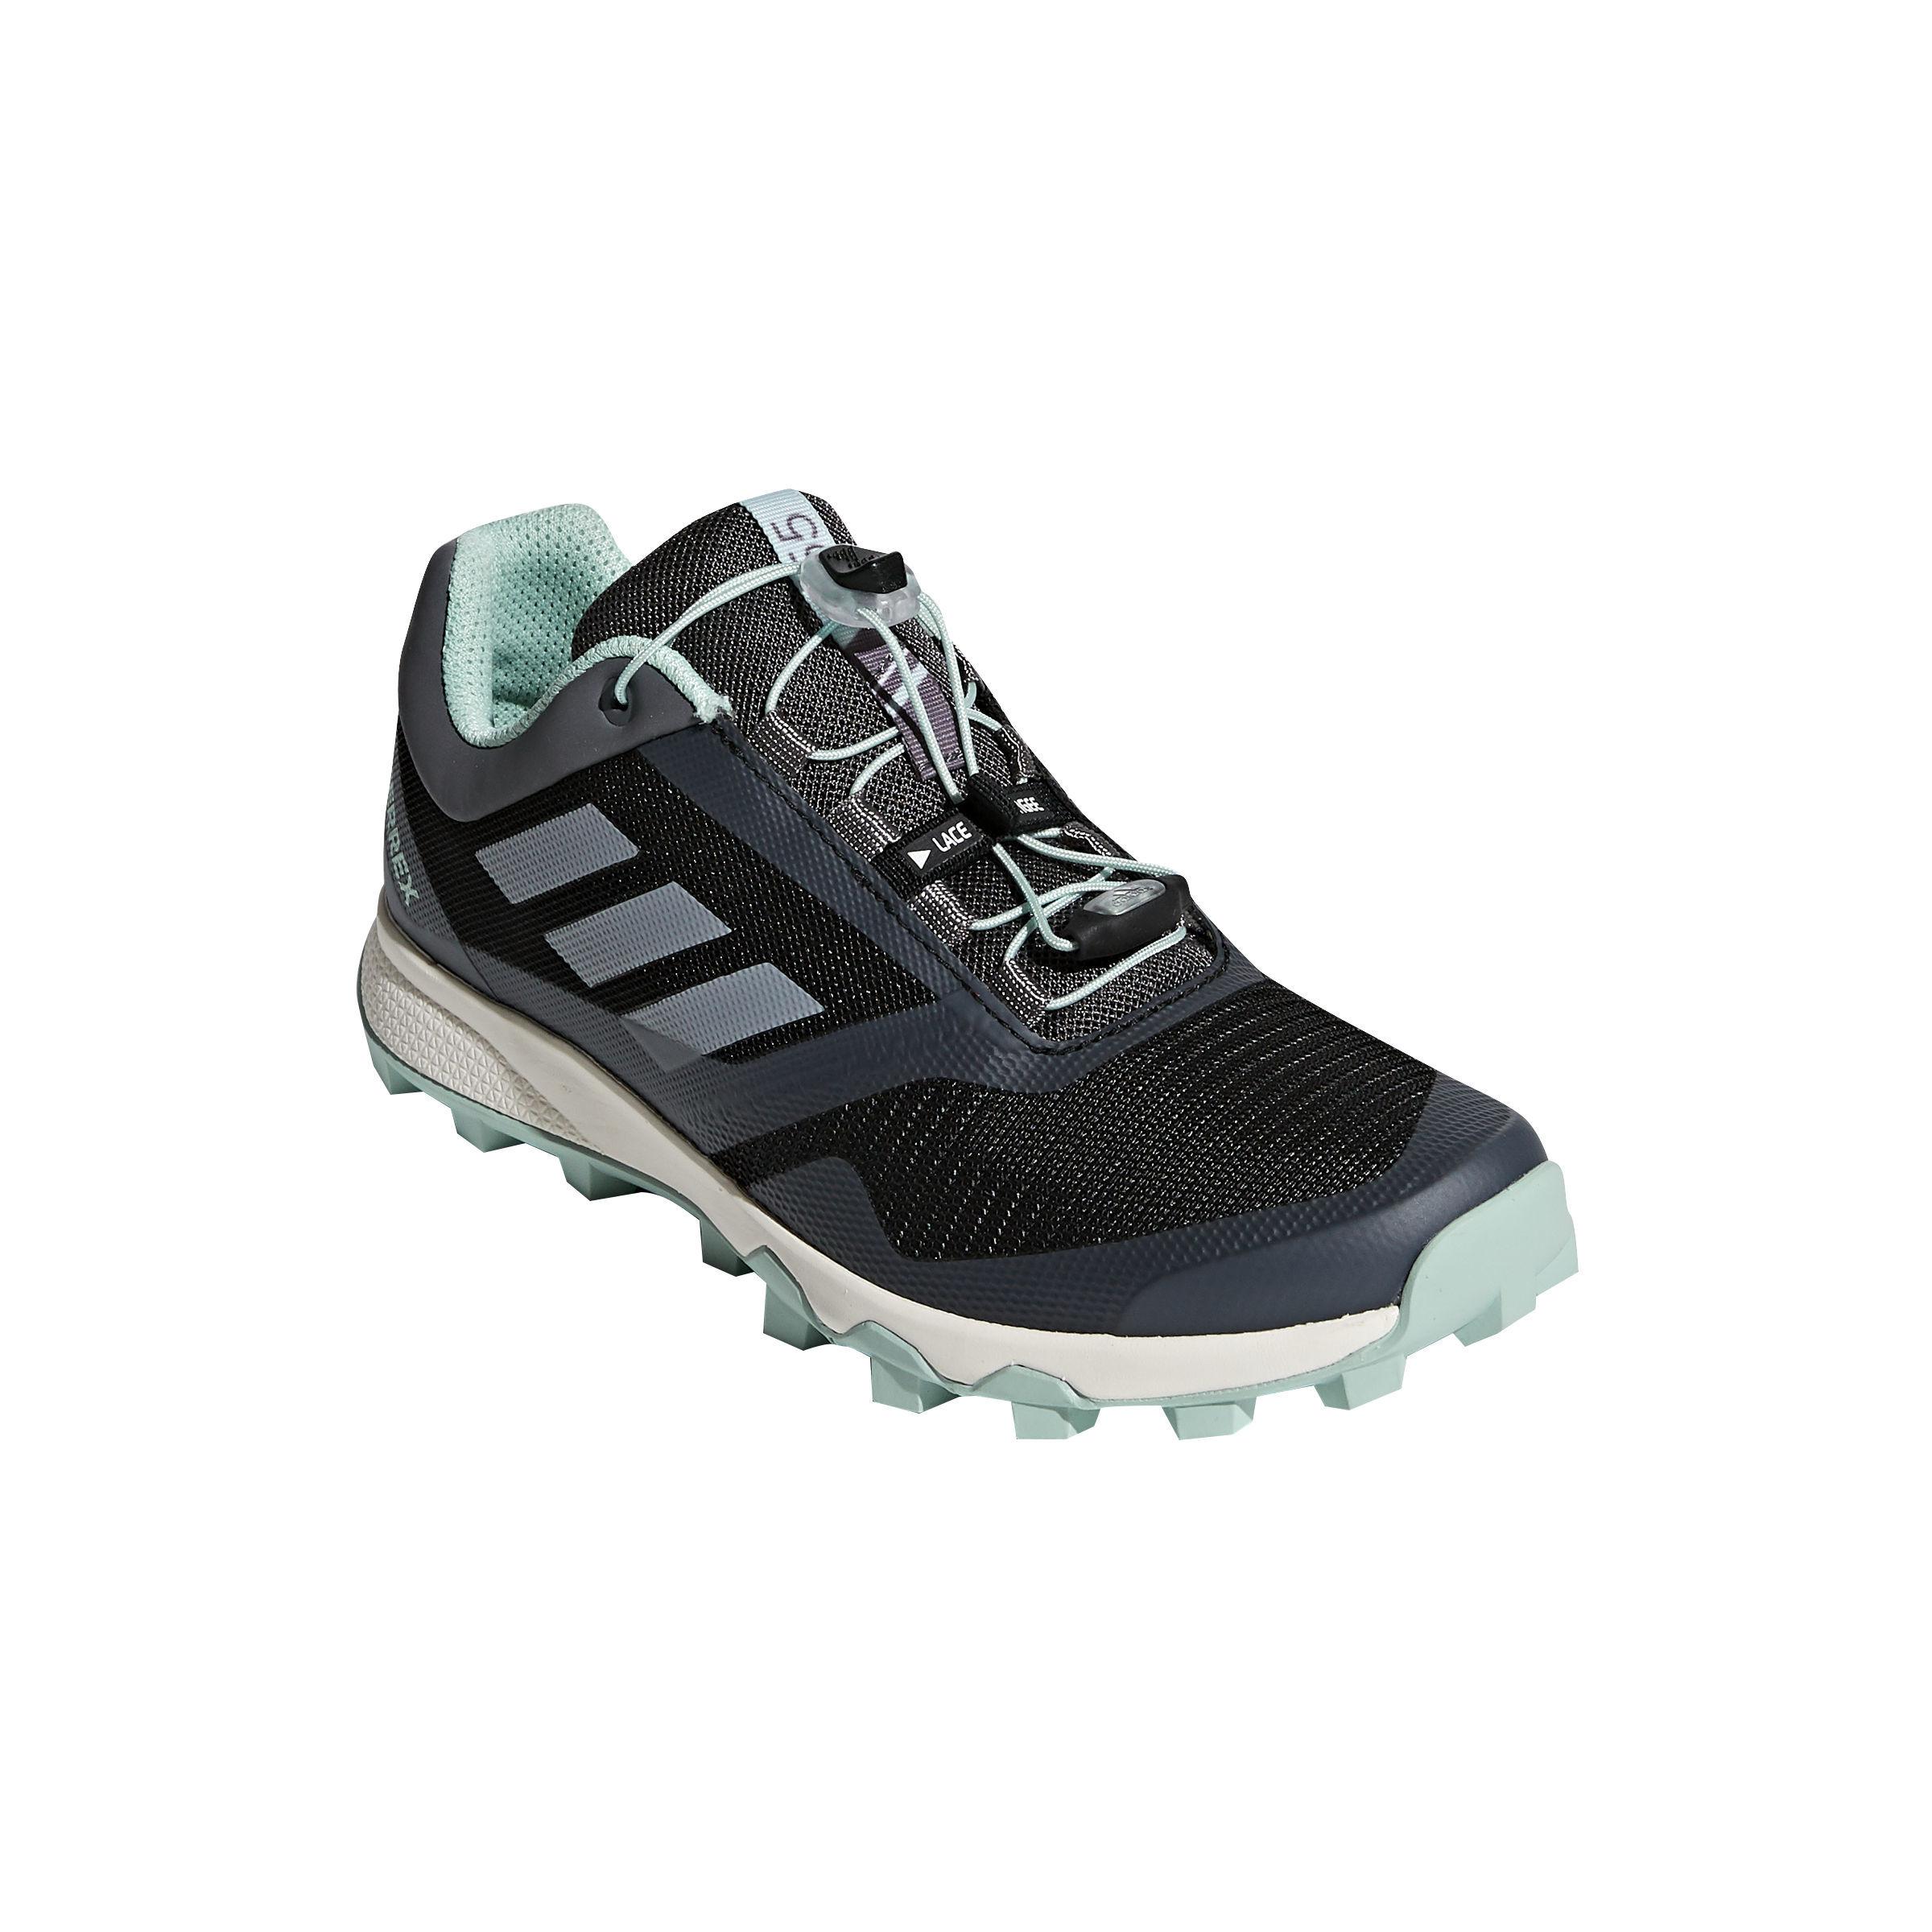 Adidas Adistar Raven Boost Women's Trail Running Shoes 8.5